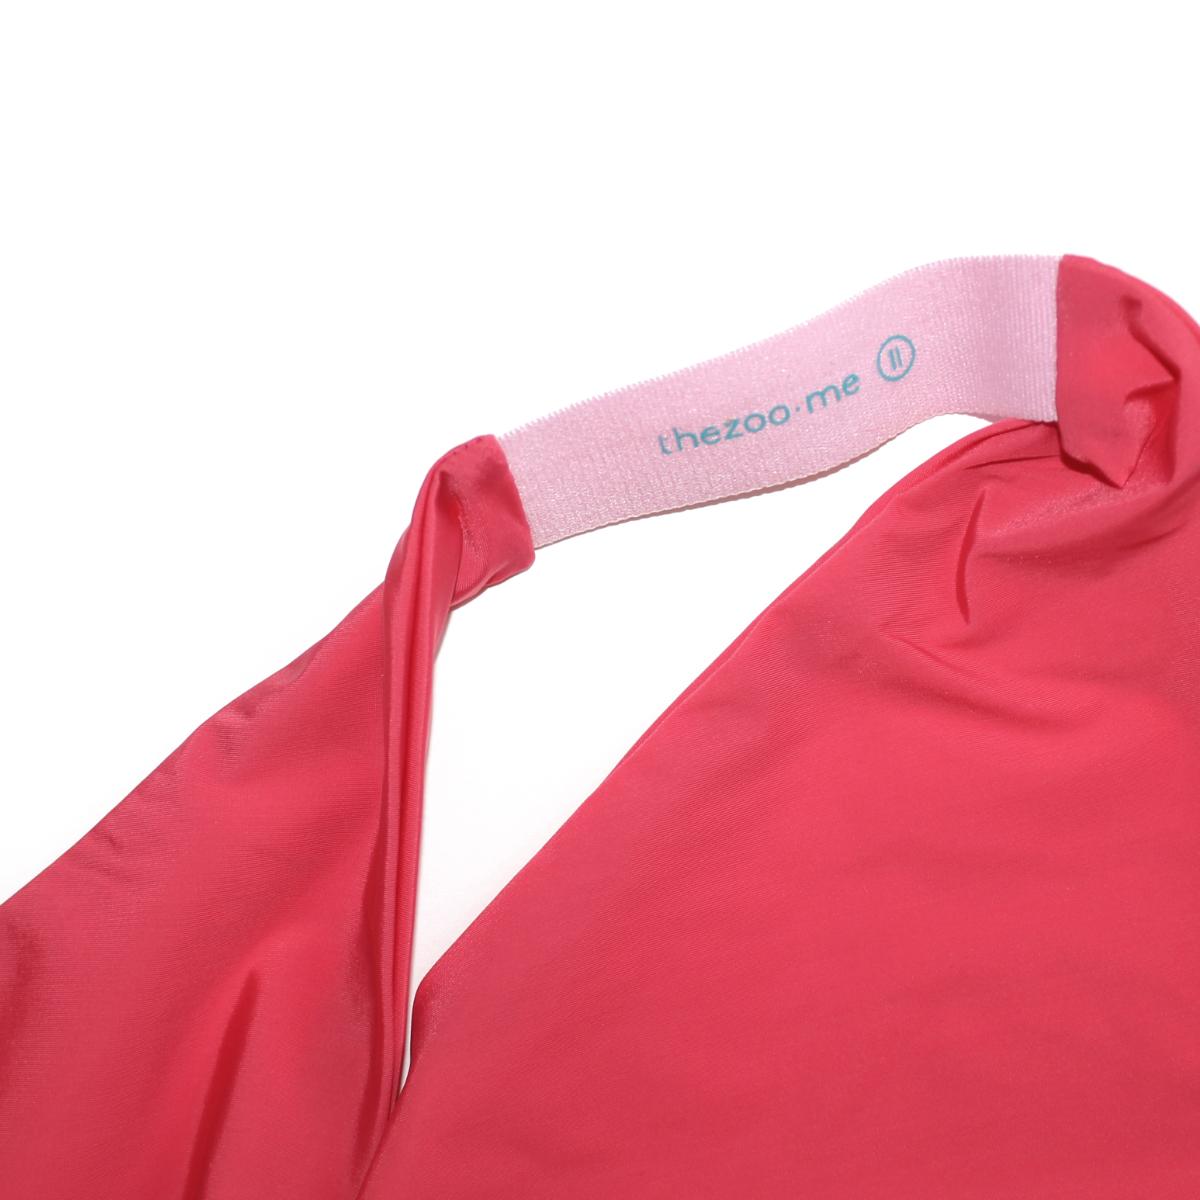 Slip red coral pink